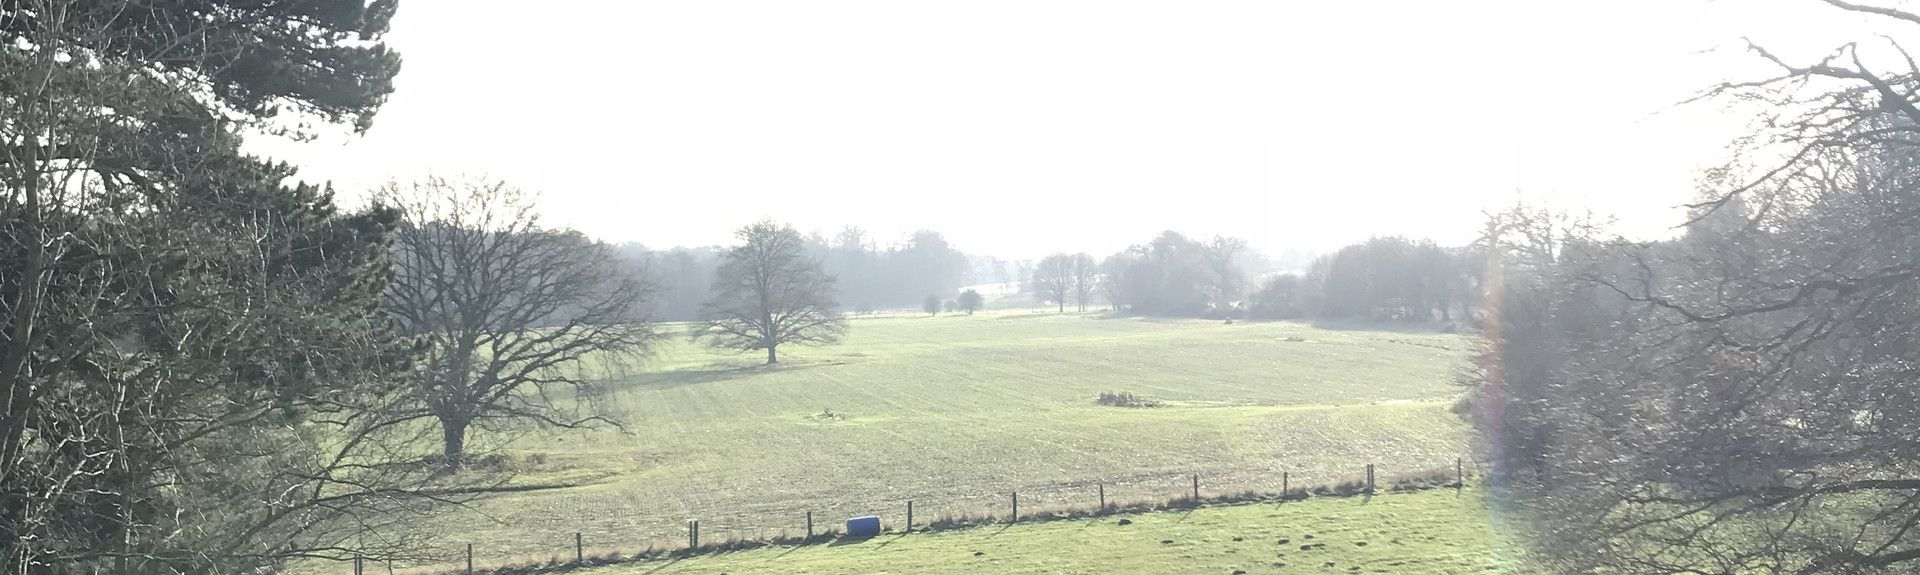 Shere, Guildford, England, United Kingdom